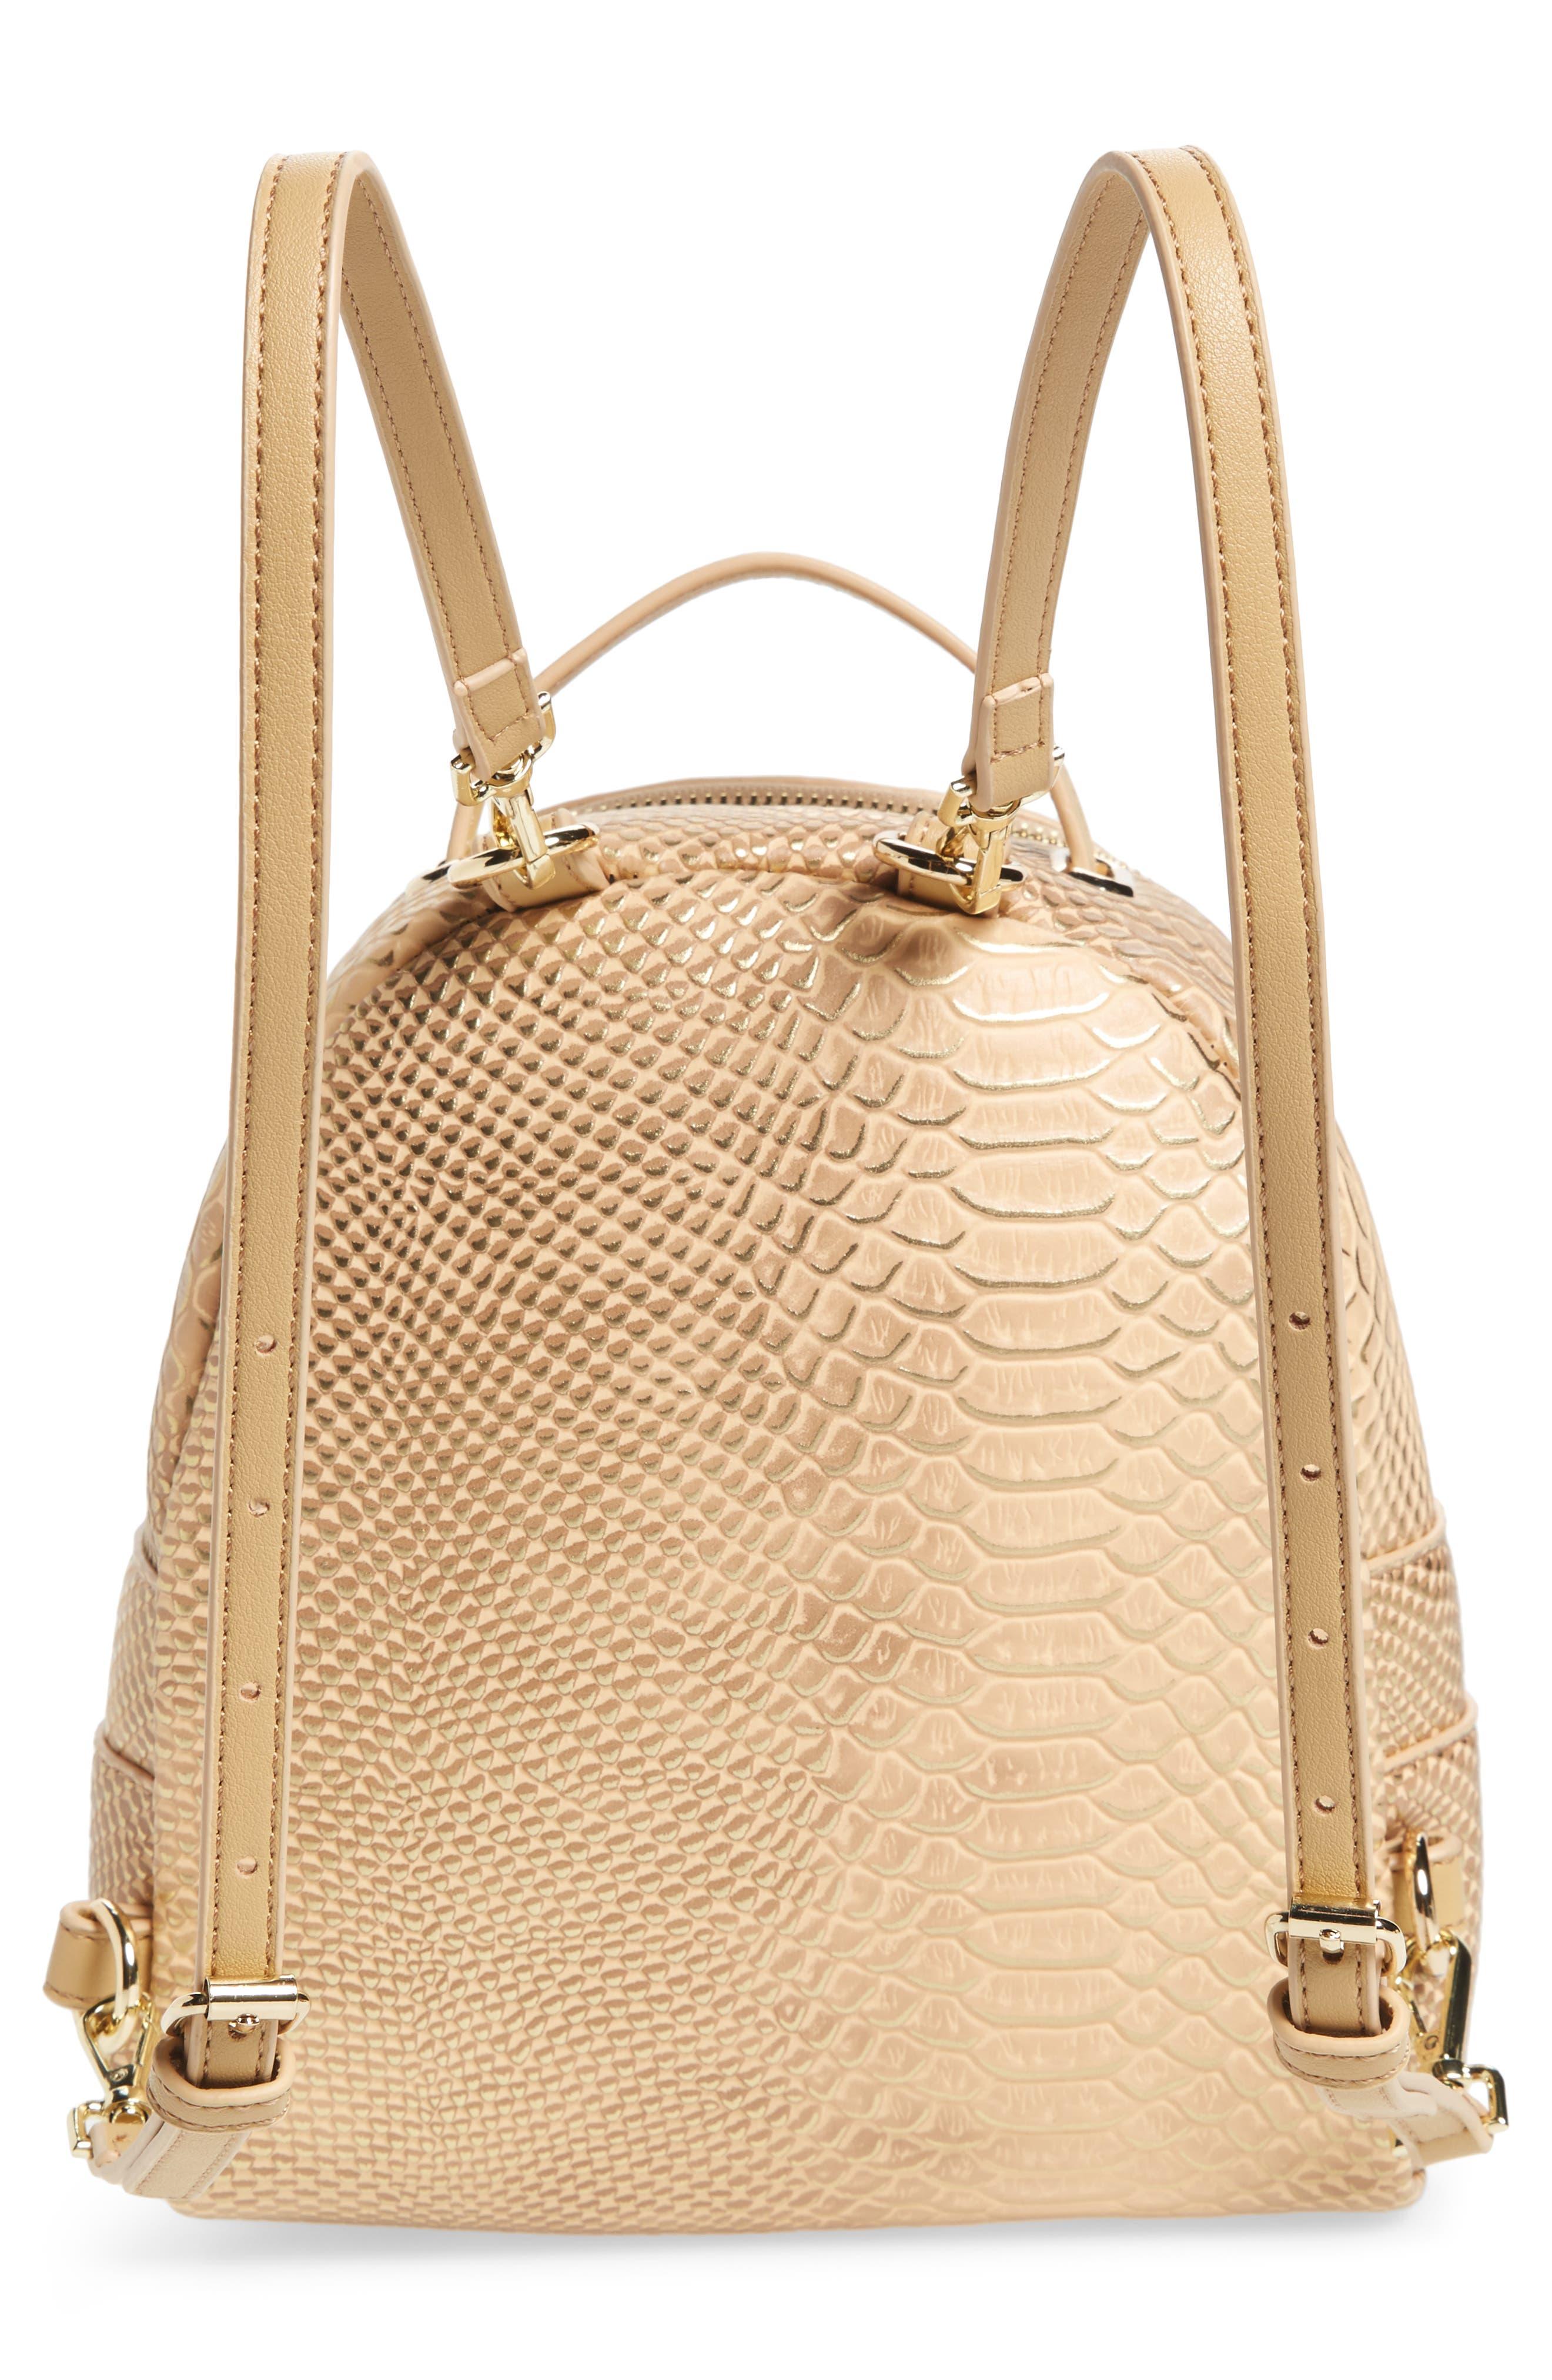 Colette Faux Leather Backpack,                             Alternate thumbnail 3, color,                             250